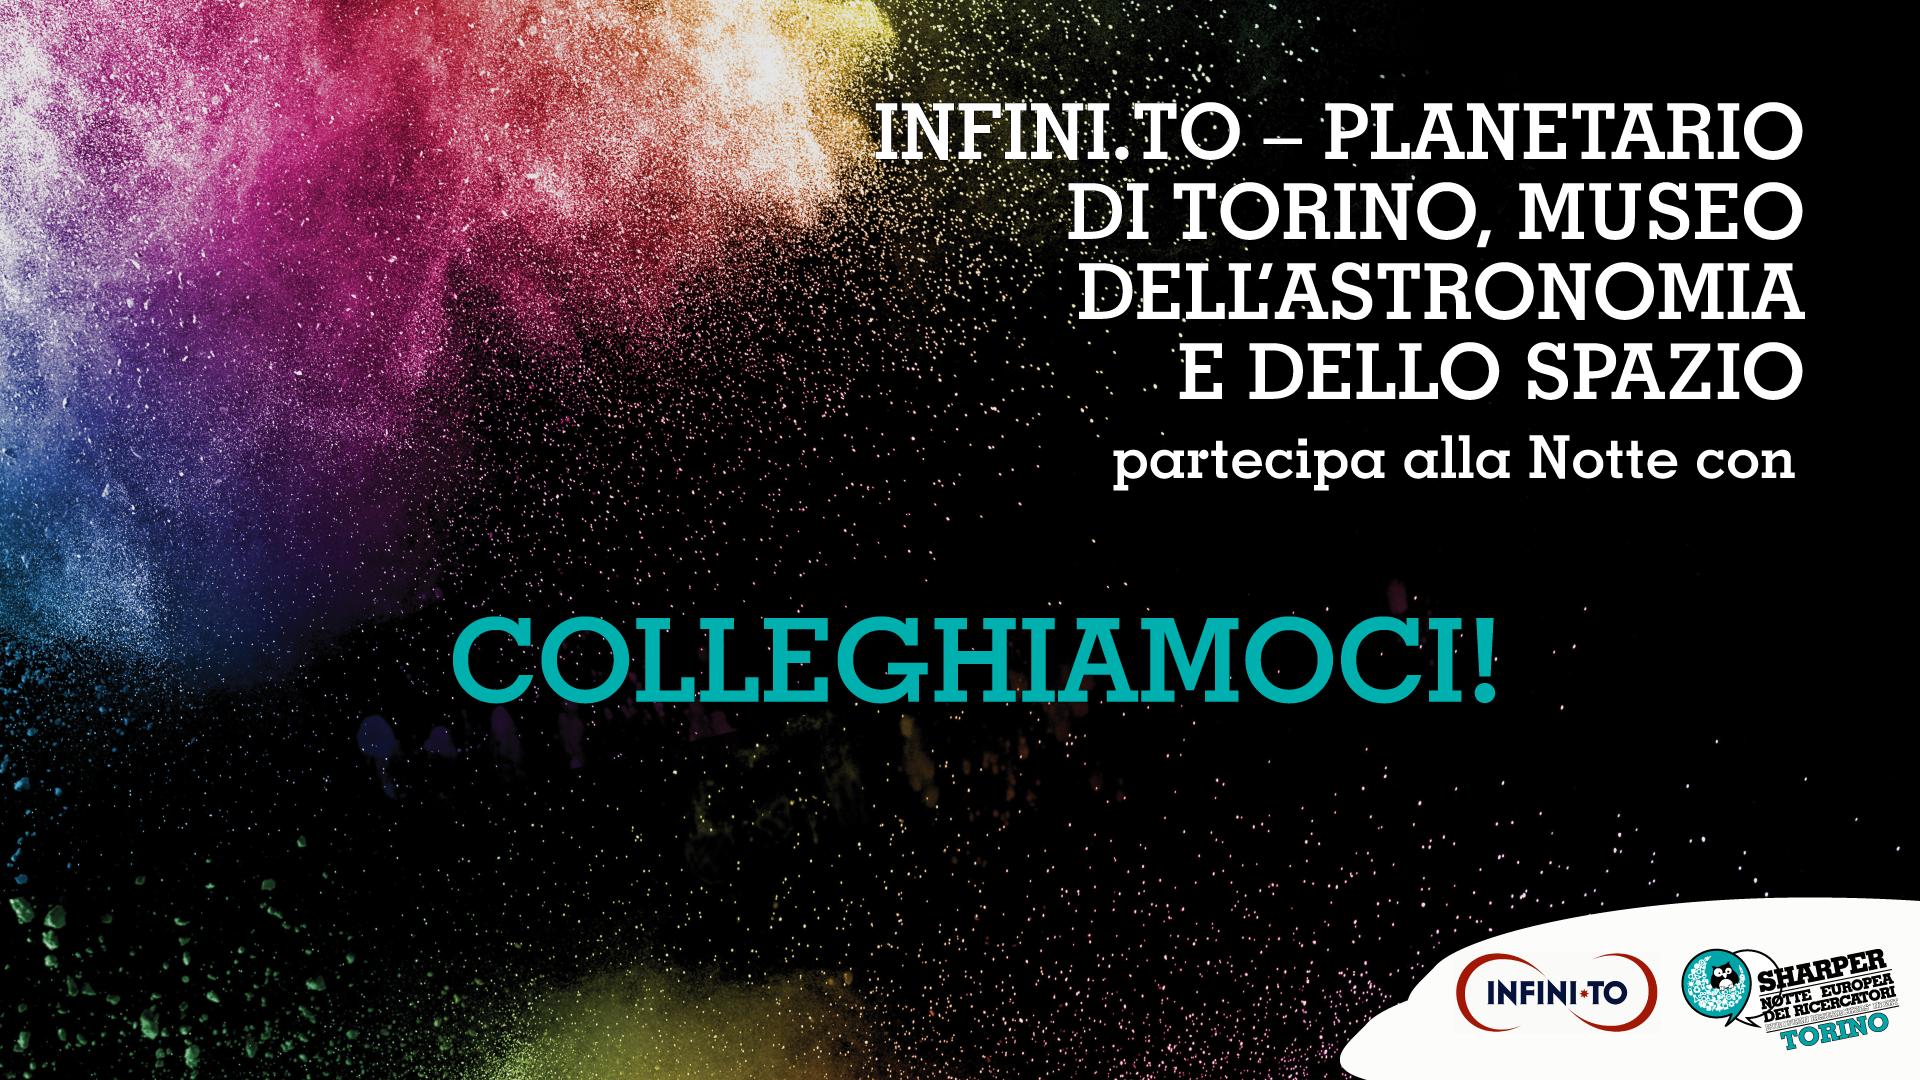 Infini.to-Planetario di Torino